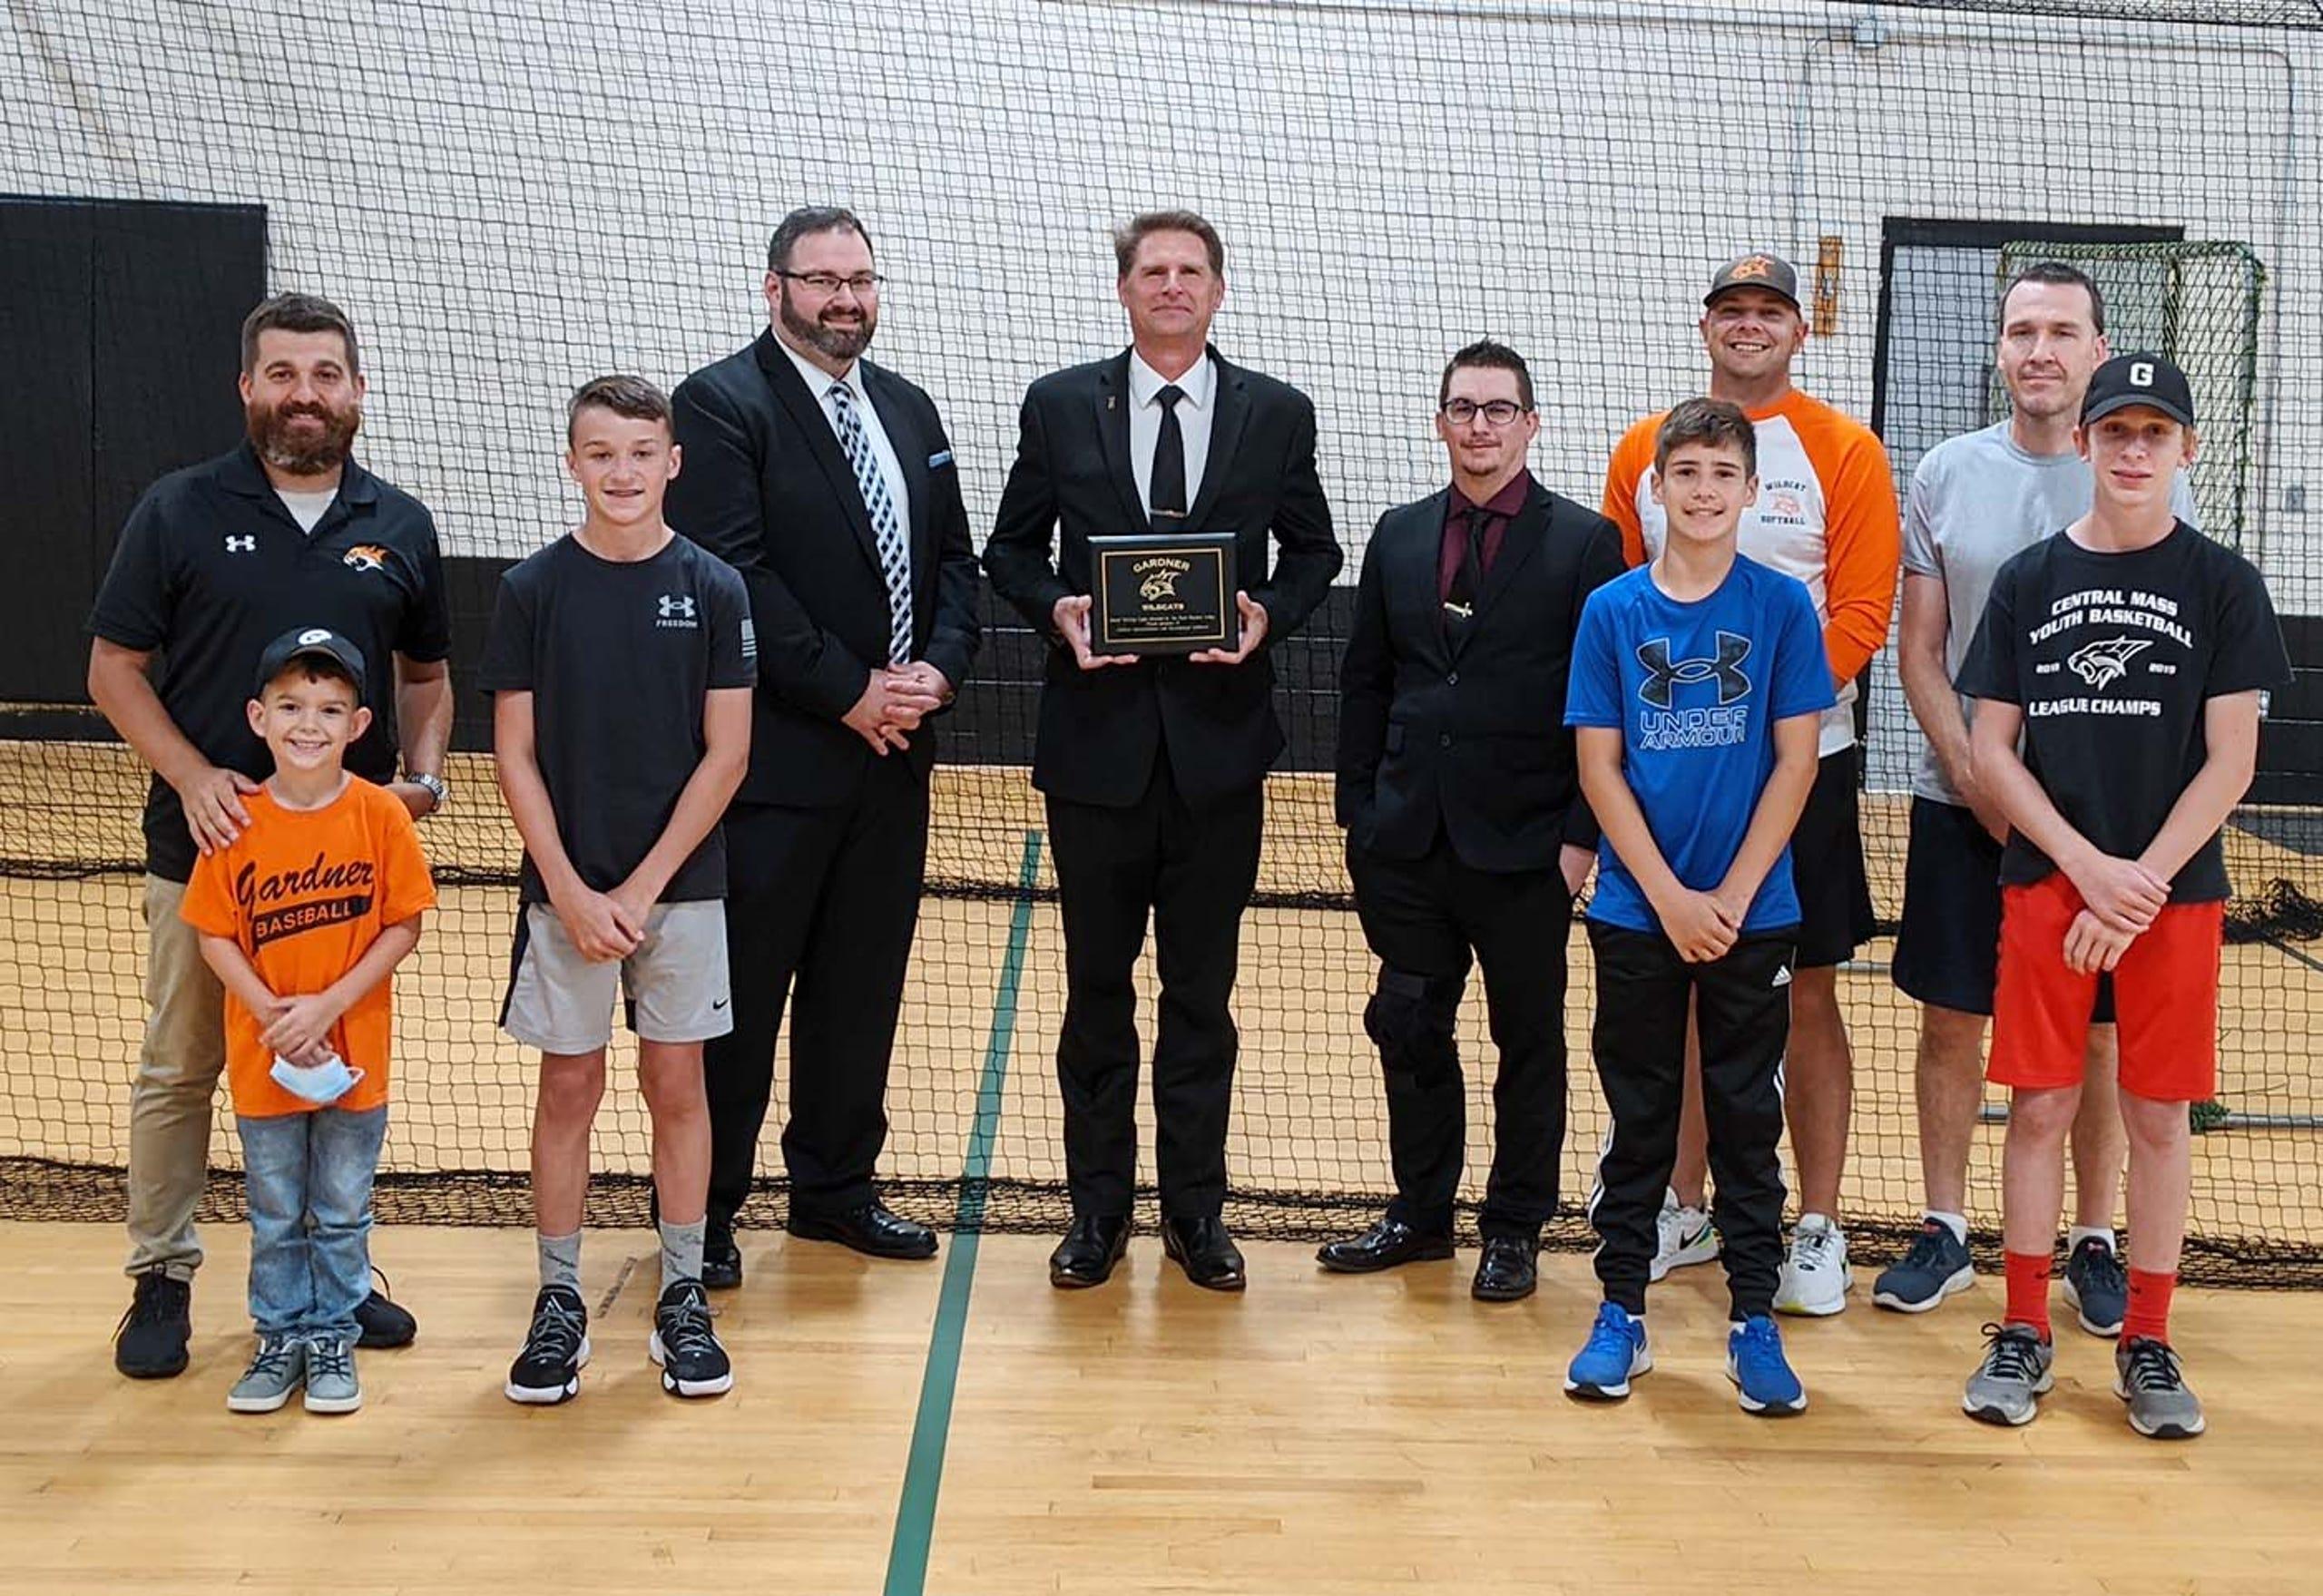 Massachussets/U.S. - Hope Masonic Lodge celebrates 150th anniversary with donation to Gardner High athletics